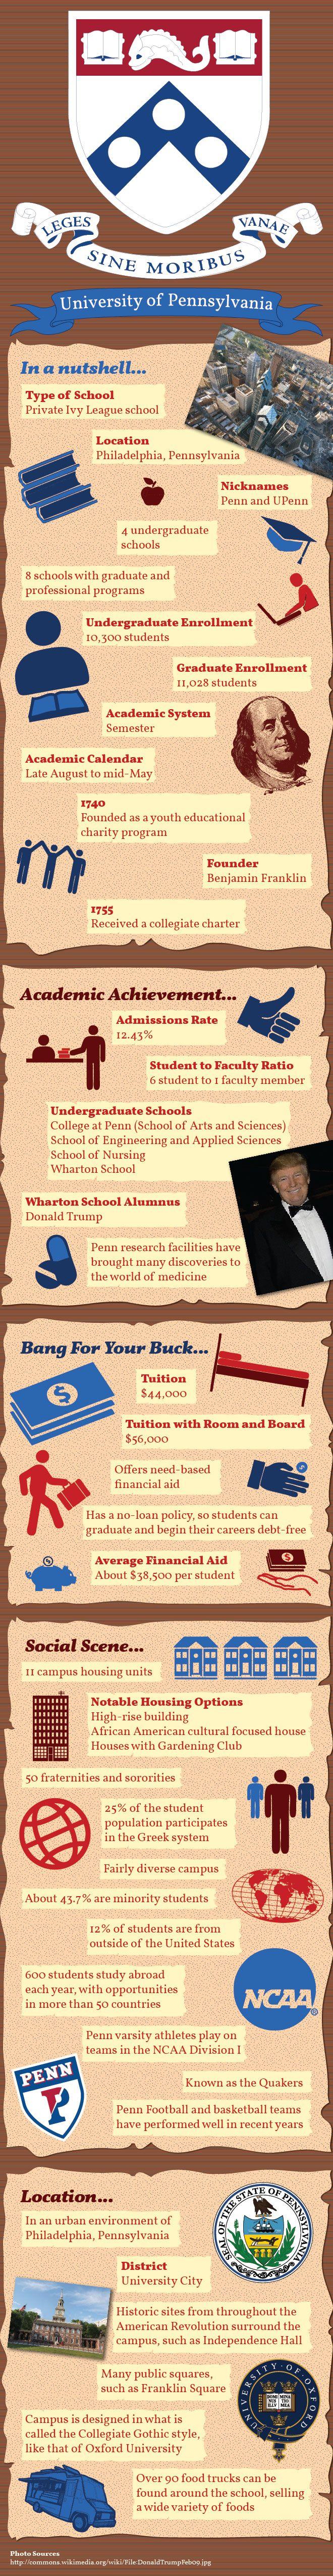 University of Pennsylvania - An #Infographic